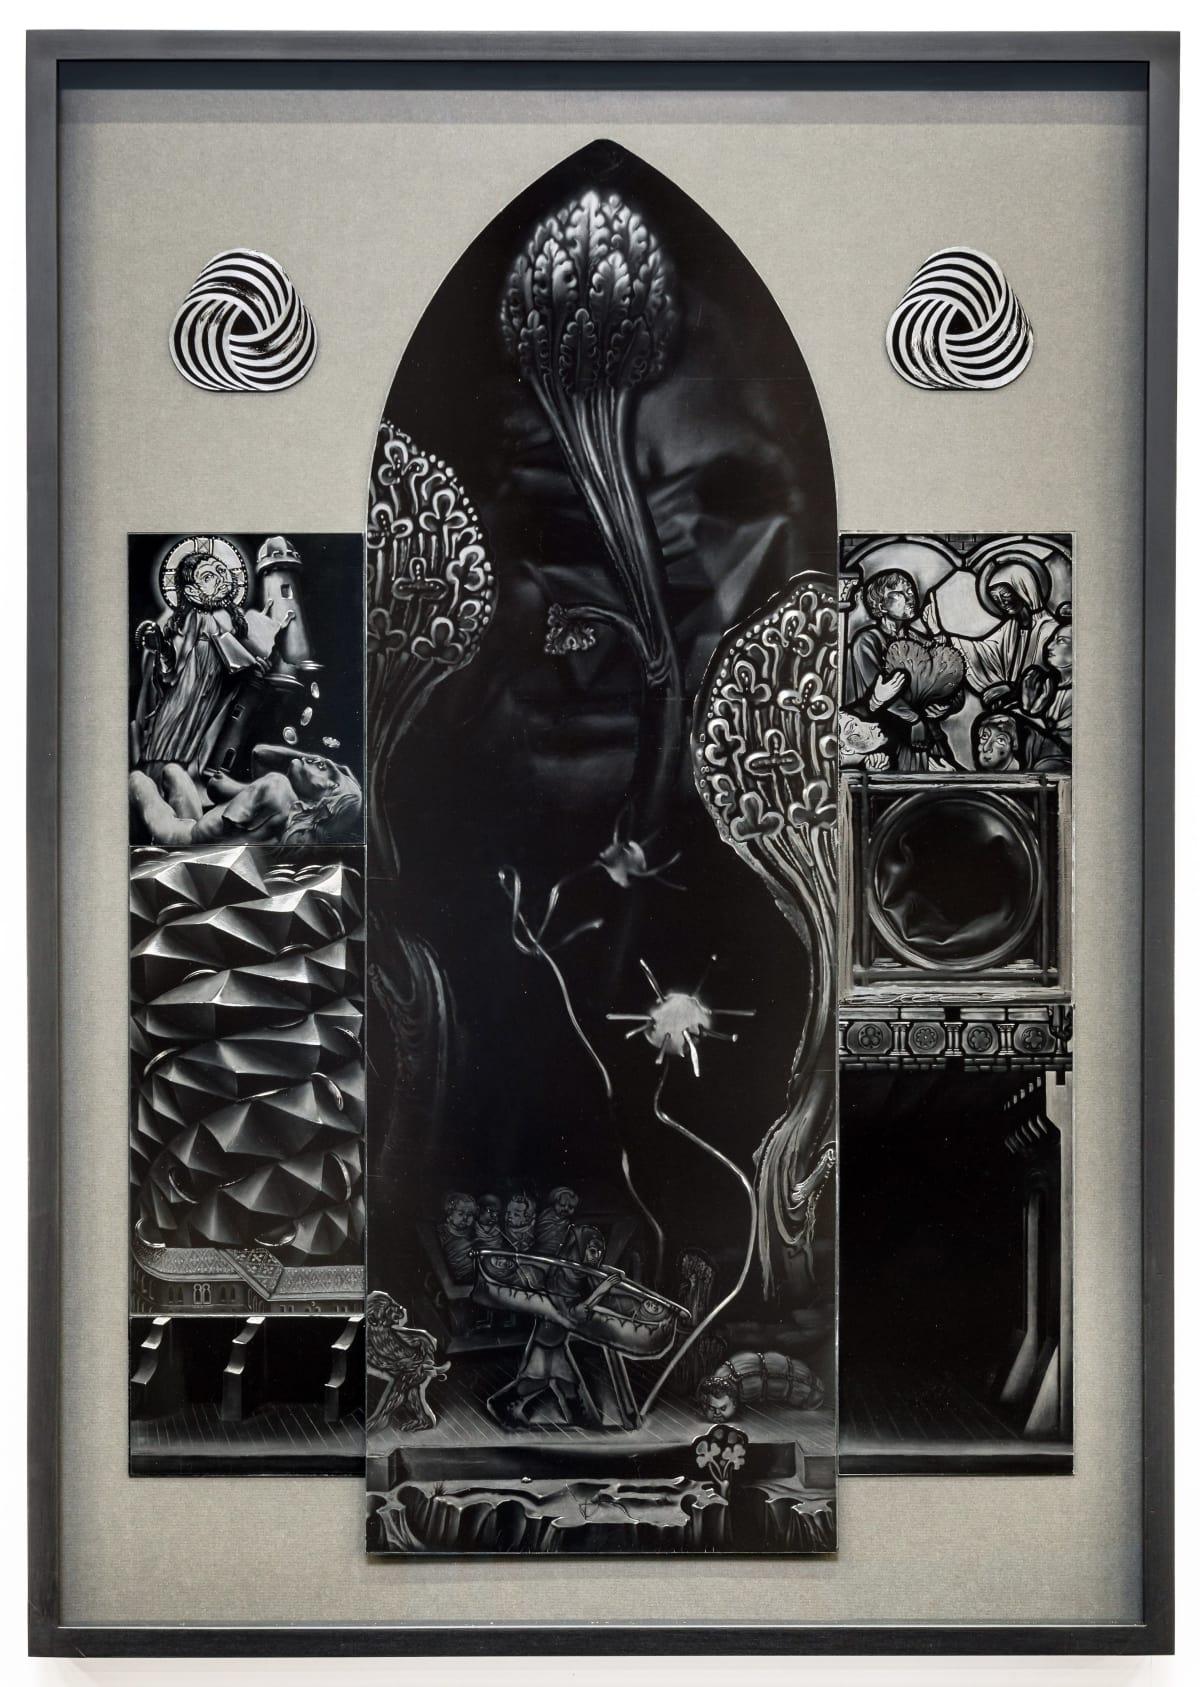 Robert McNally  Bonafide Malafide, 2016  Graphite on ultra-black carbon nanotube coated aluminium  102 x 72 cm  40 1/8 x 28 3/8 in  (Framed)  Courtesy of David Risley gallery Copenhagen